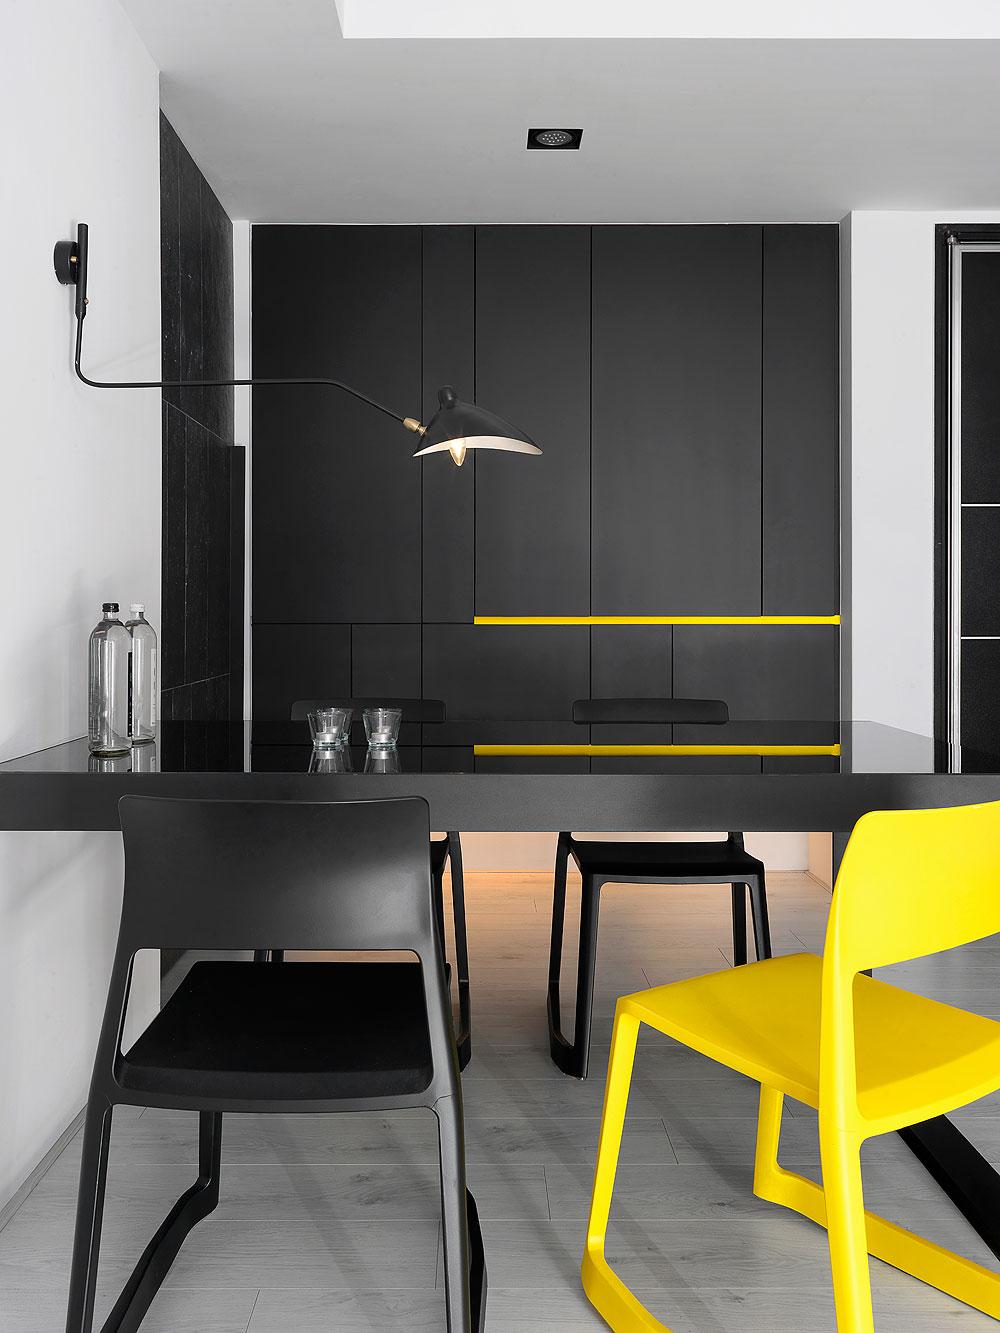 h-residence-z-axis-design (10)